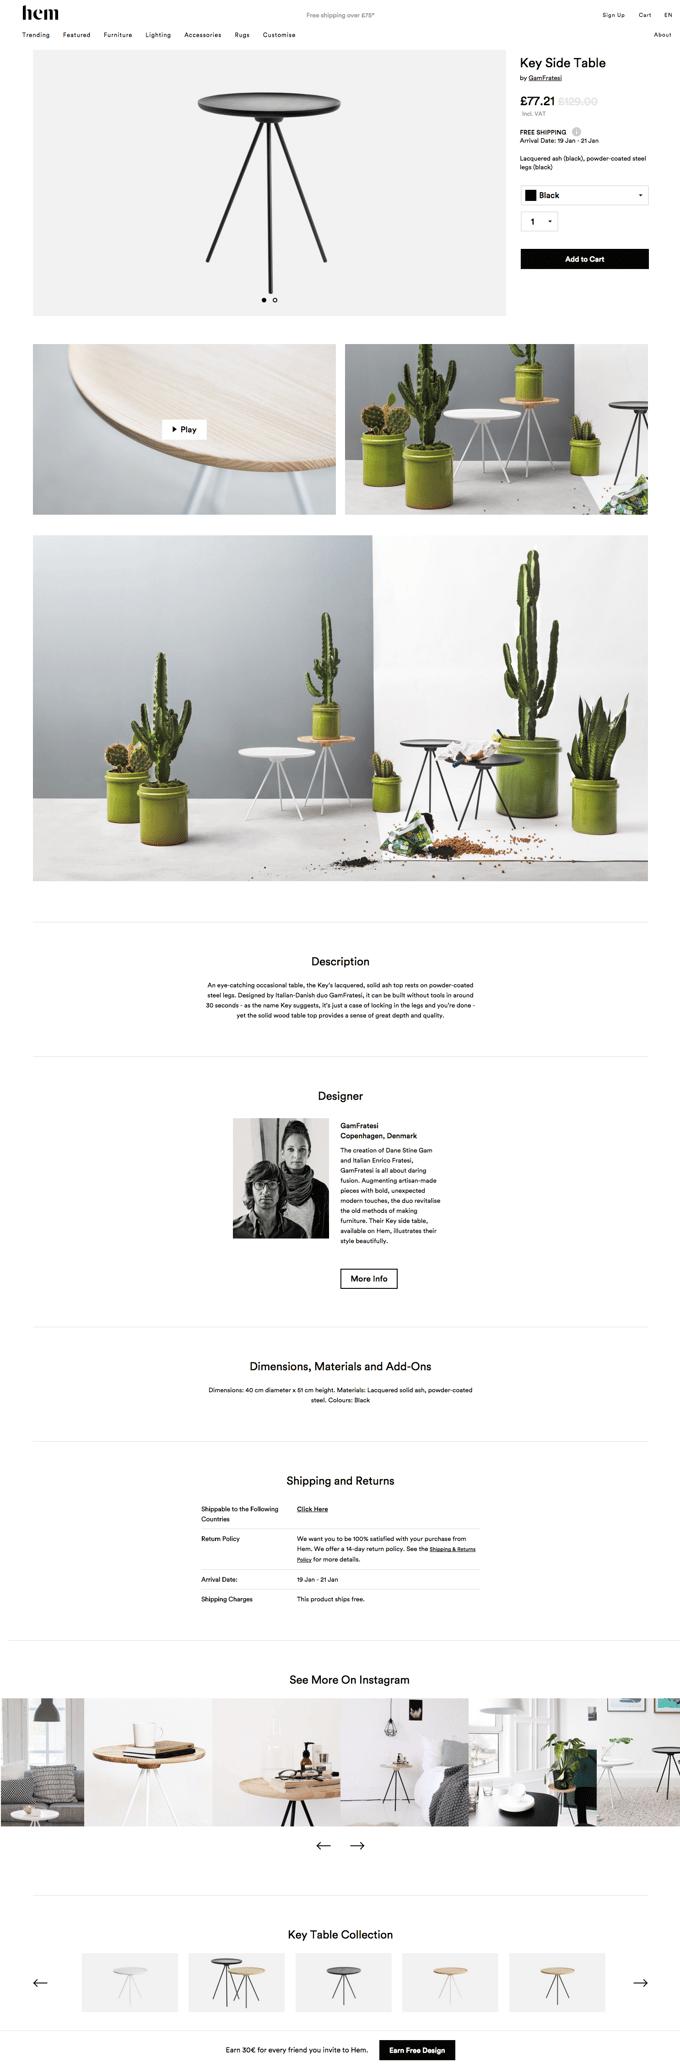 Hem product page